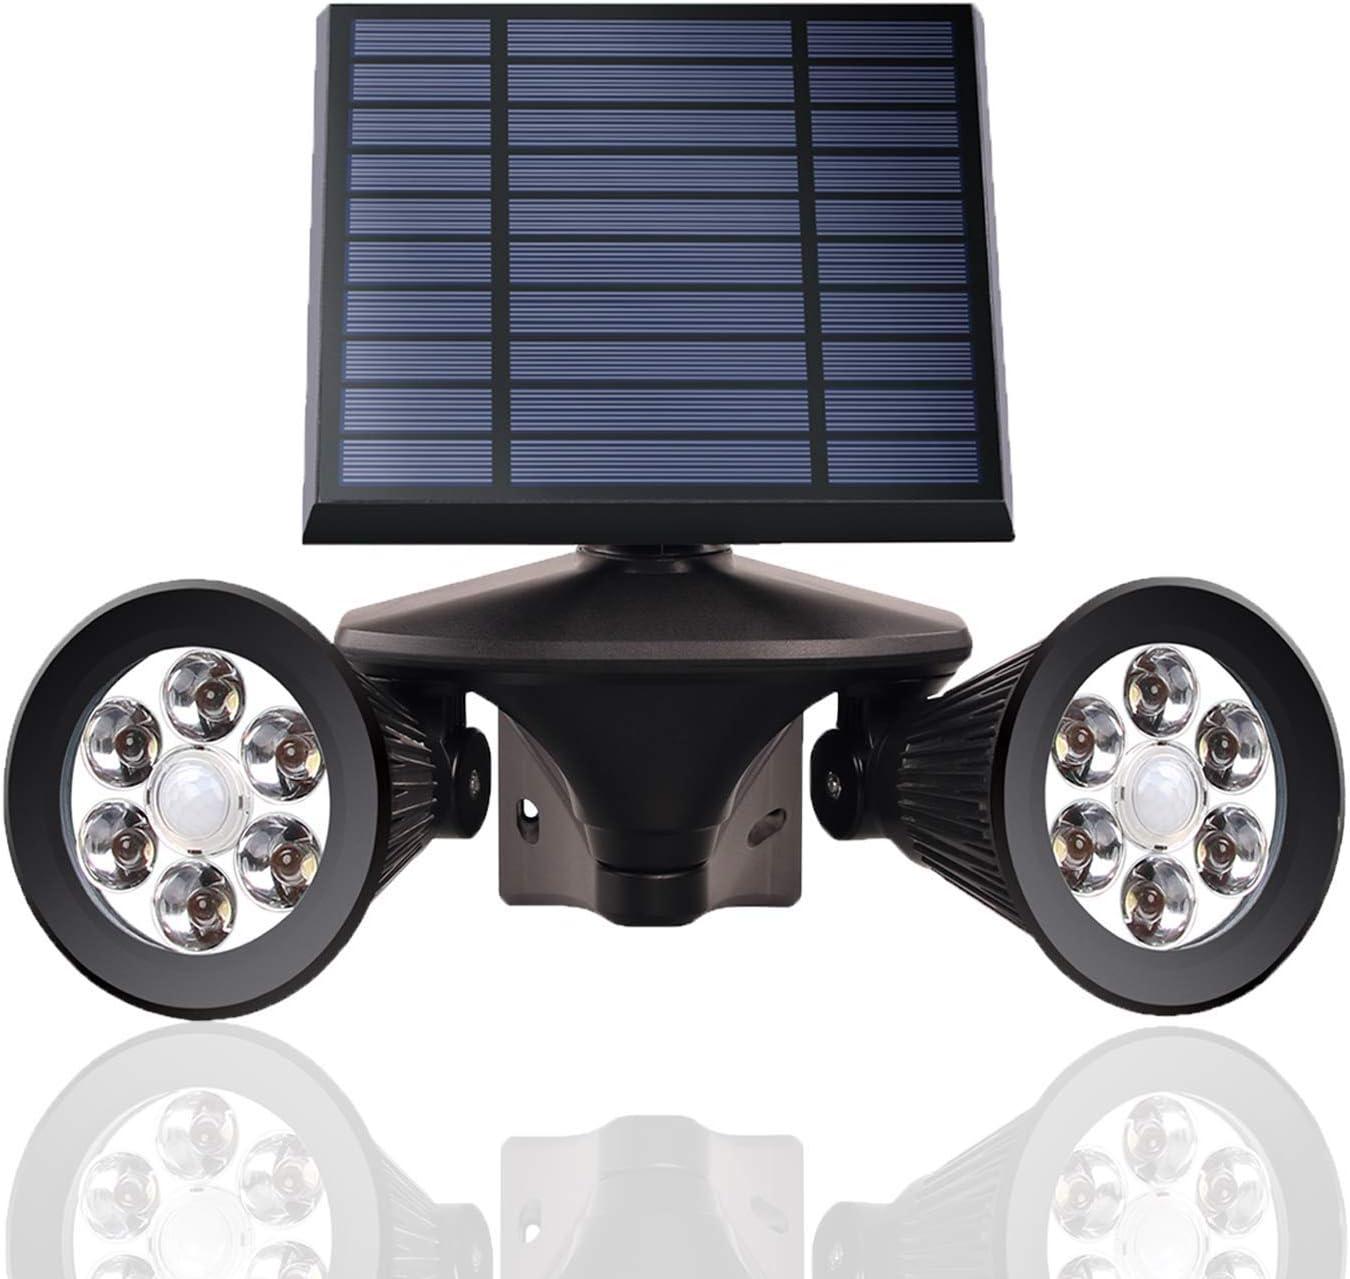 Outdoor Solar Light Motion Sensor, 4500mAh LED Dusk to Dawn Security Lights, 6500K Daywhite, IP65 Waterproof Pathway Solar Powered Wireless Flood Lights for Yard, Garage, Garden, 1-Pack, GLEEBOM